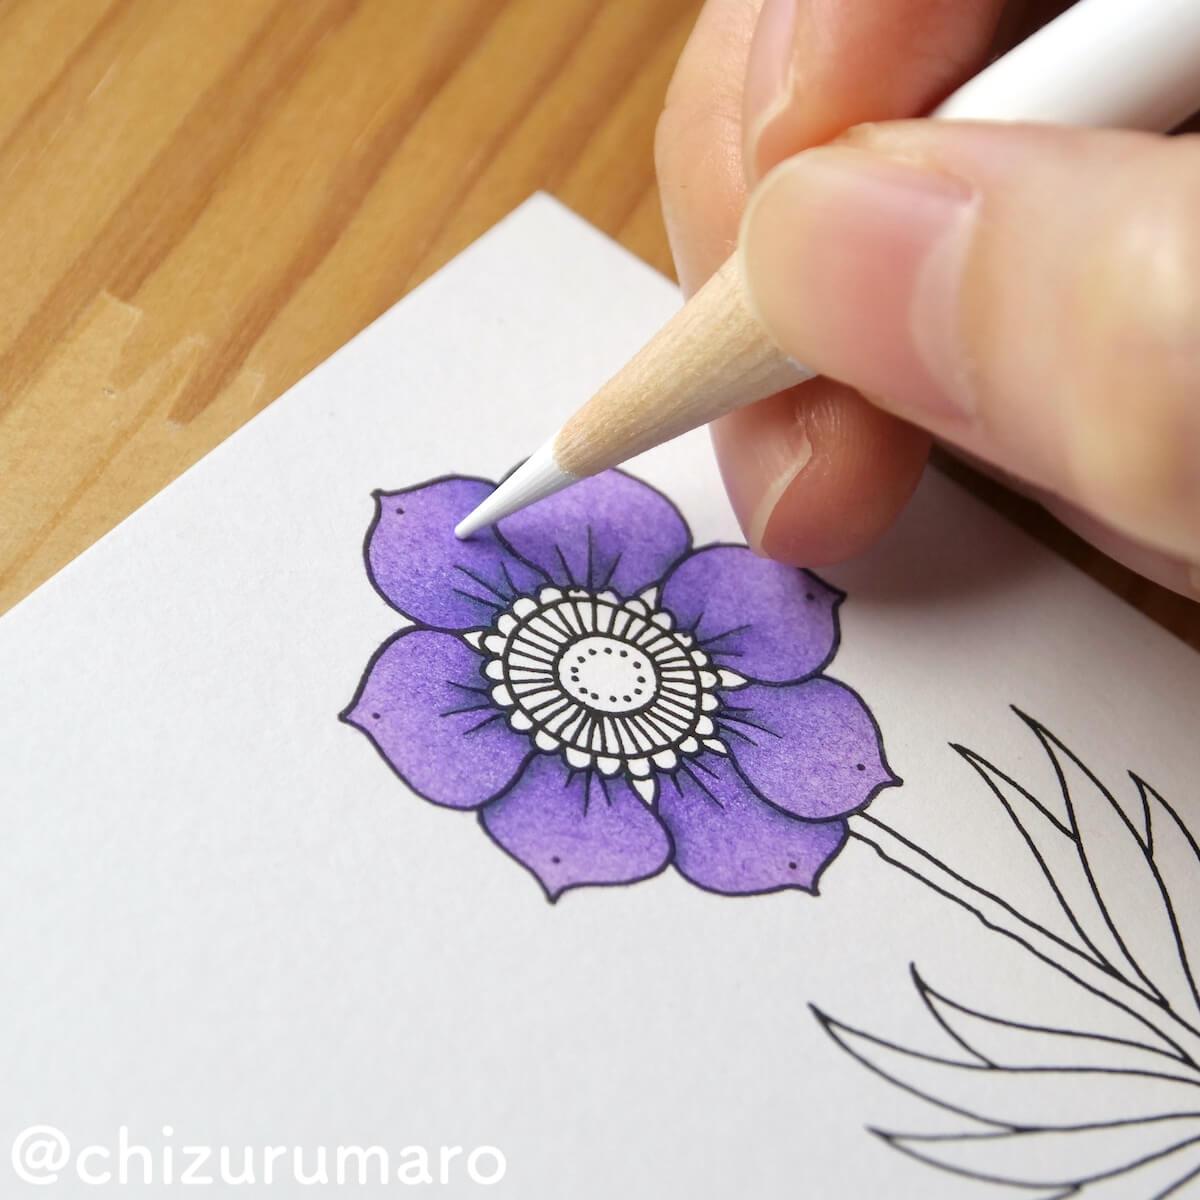 f:id:chizurumaro:20210805134957j:plain